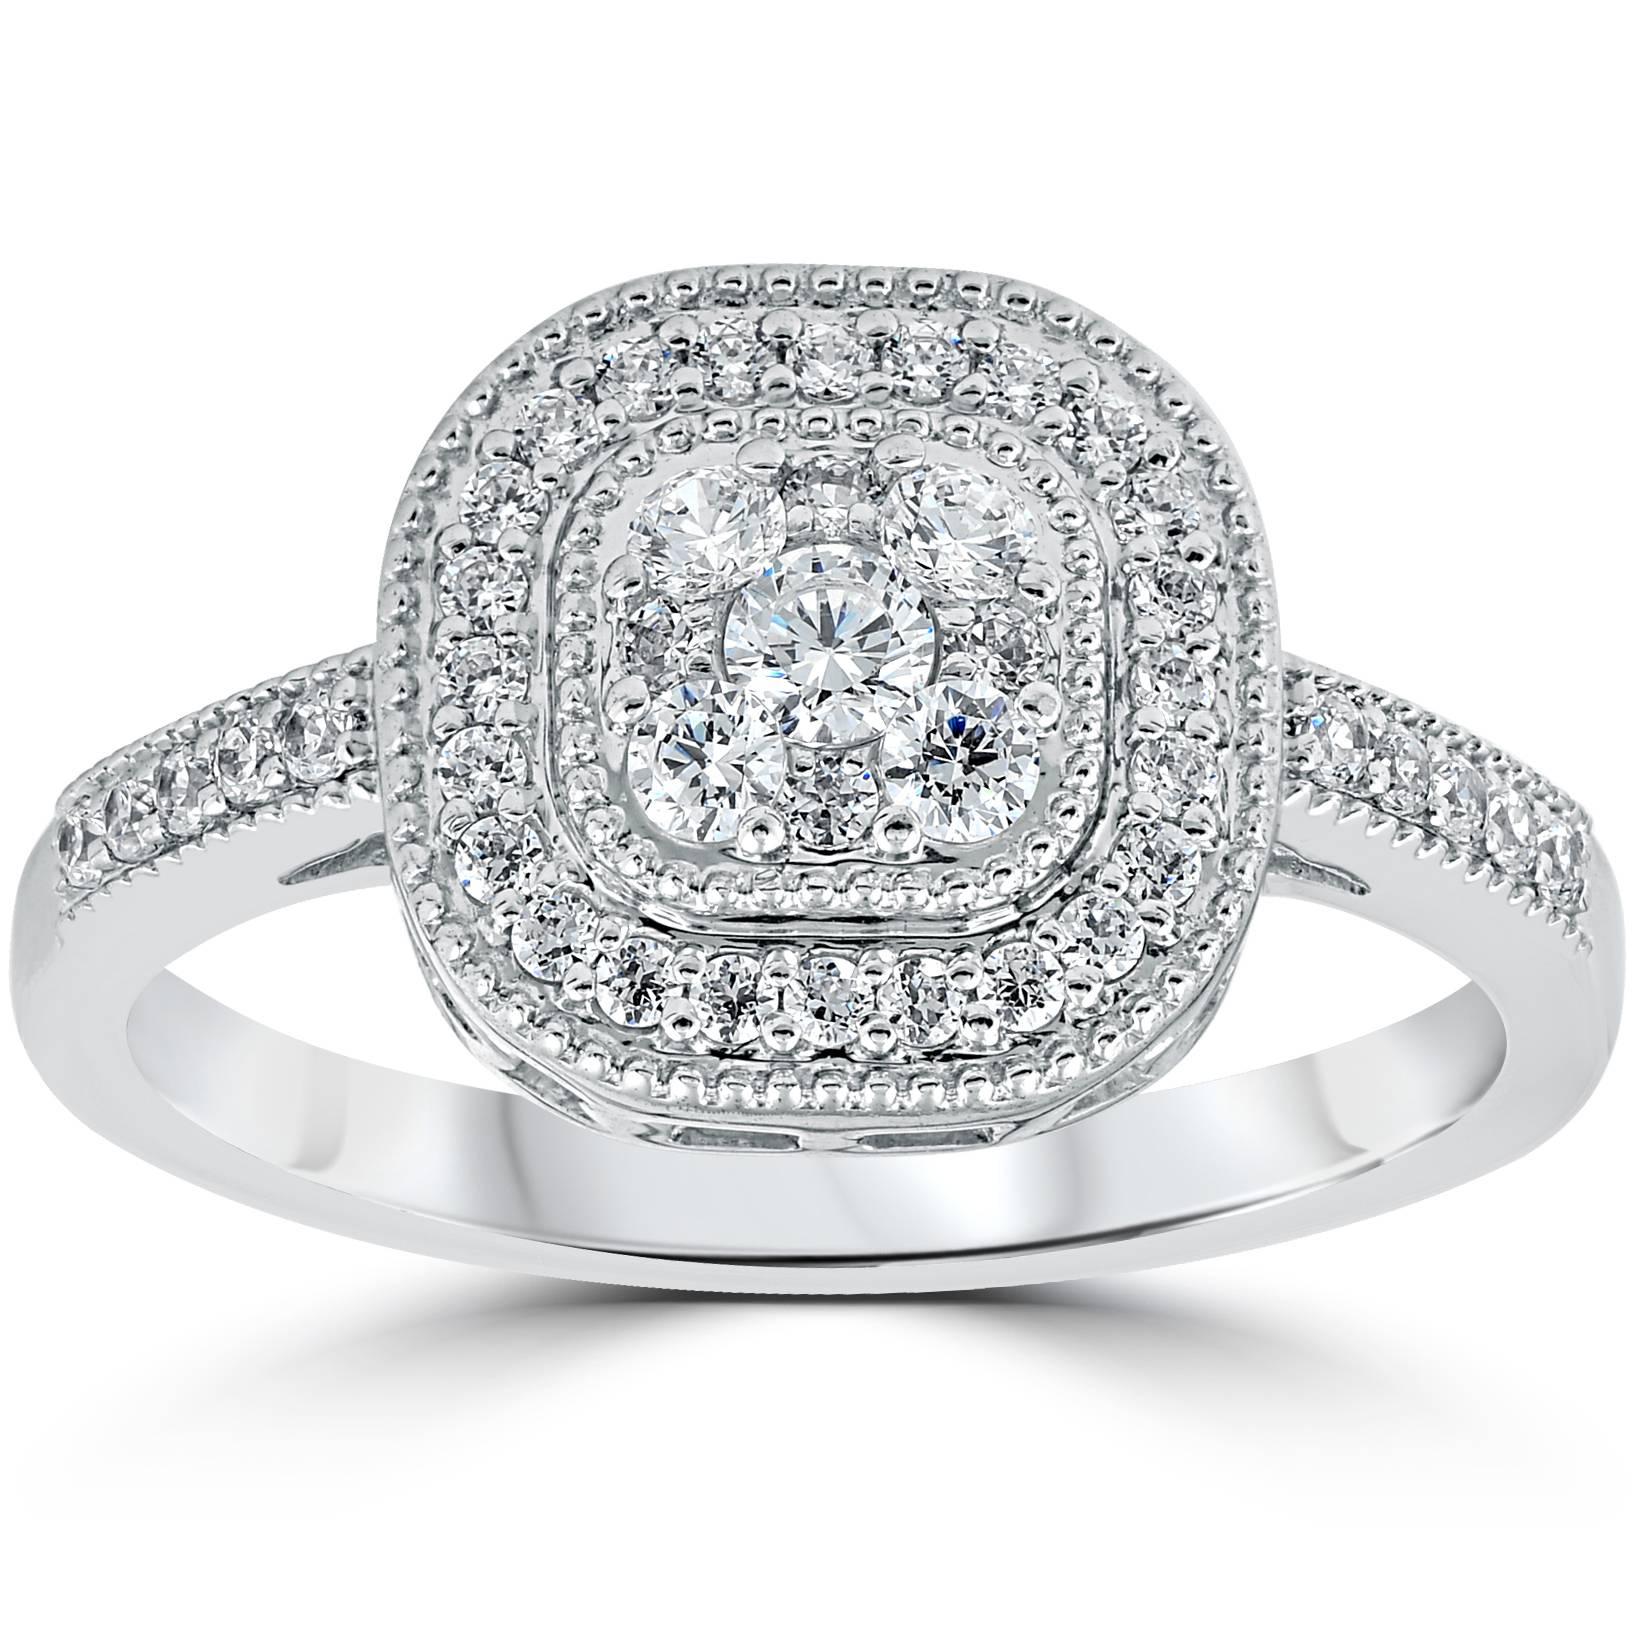 3 8ct vintage natural diamond cushion halo shape ring. Black Bedroom Furniture Sets. Home Design Ideas